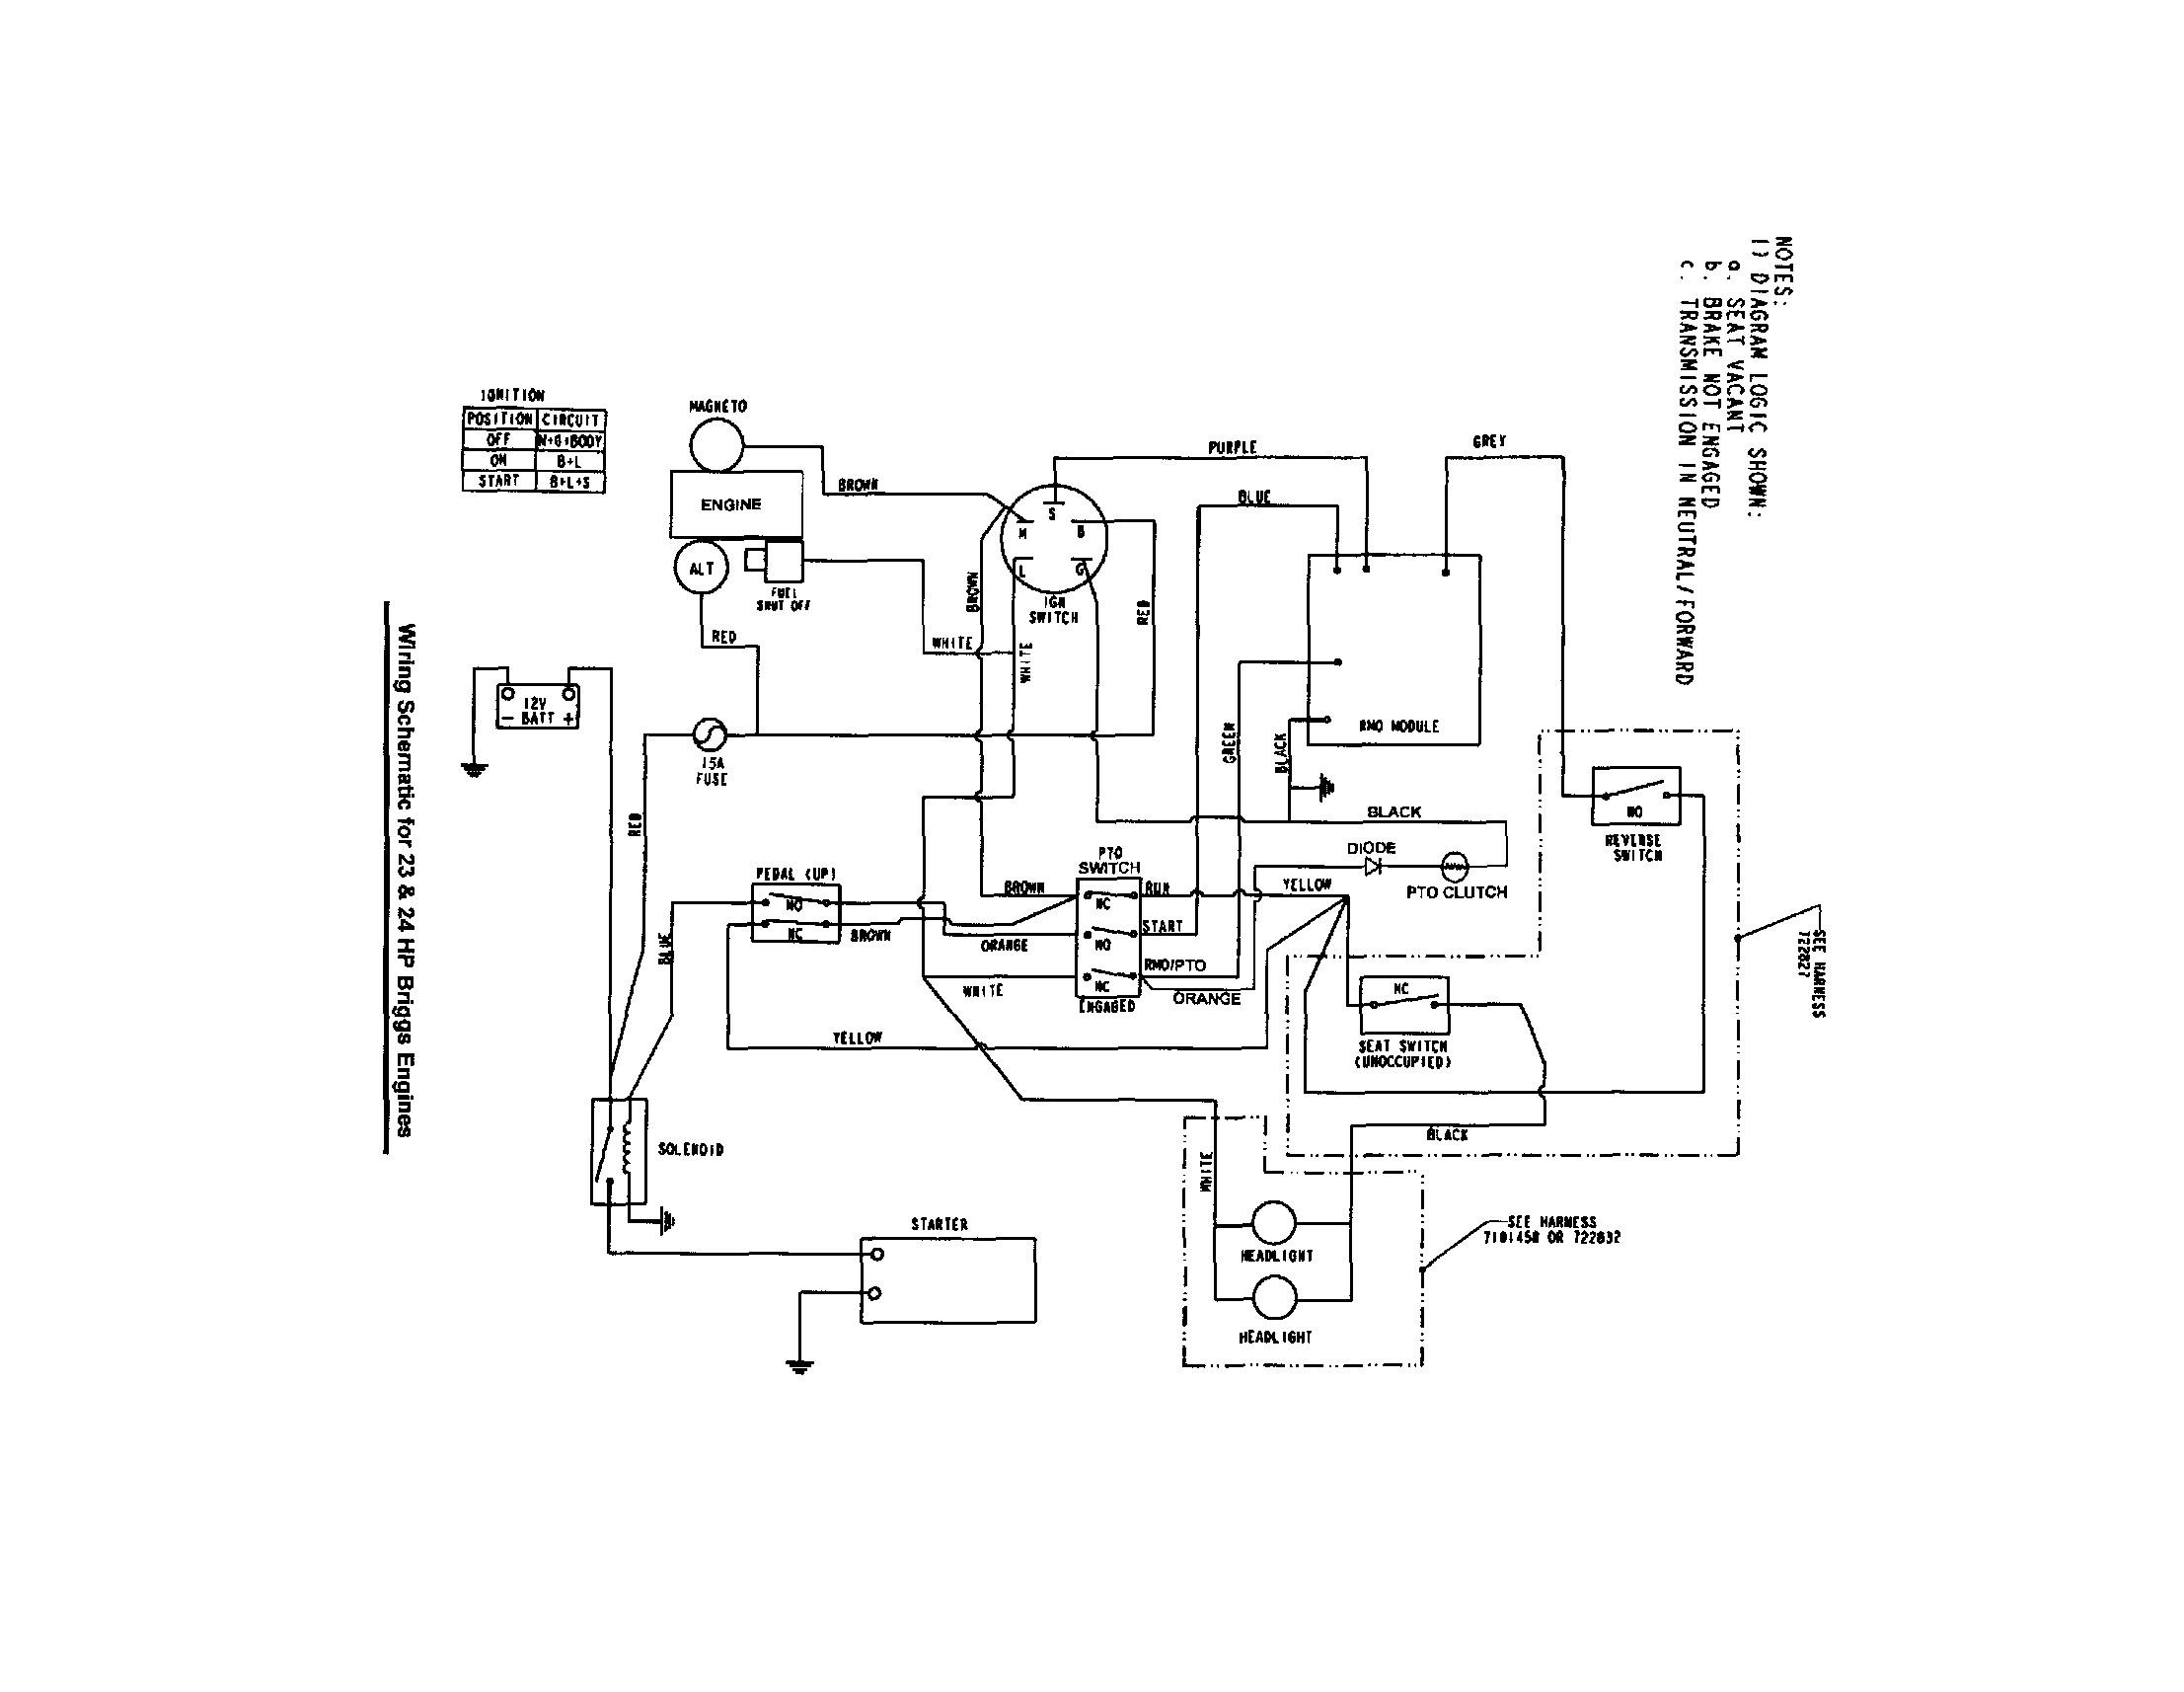 Wiring Diagram For Husqvarna Mower